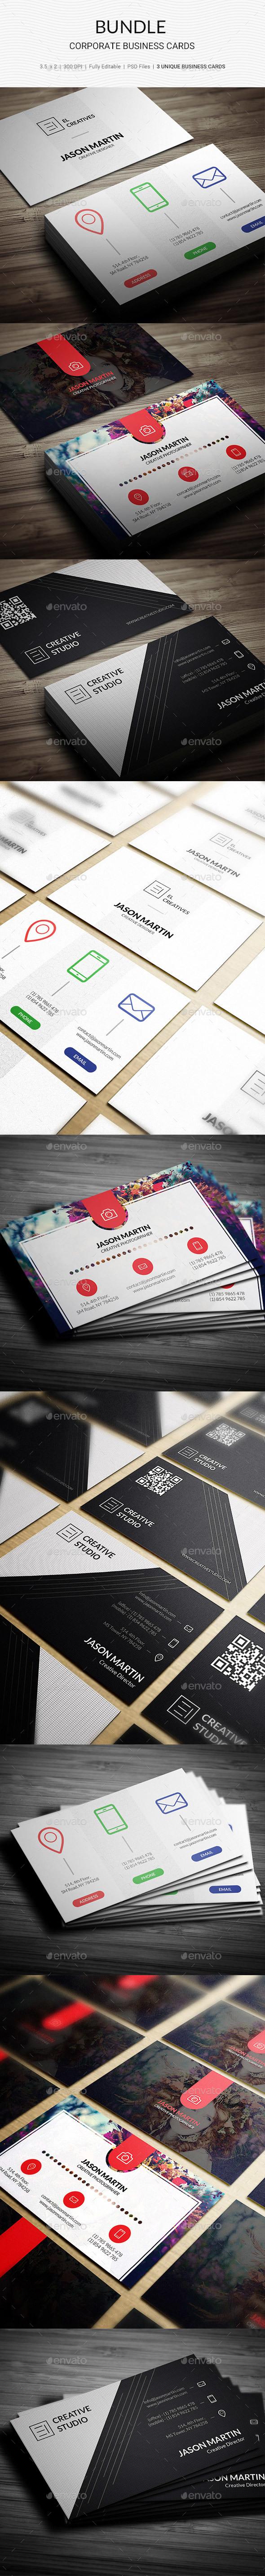 Bundle - Creaitve Business Cards - 3 in 1 - 164 - Creative Business Cards